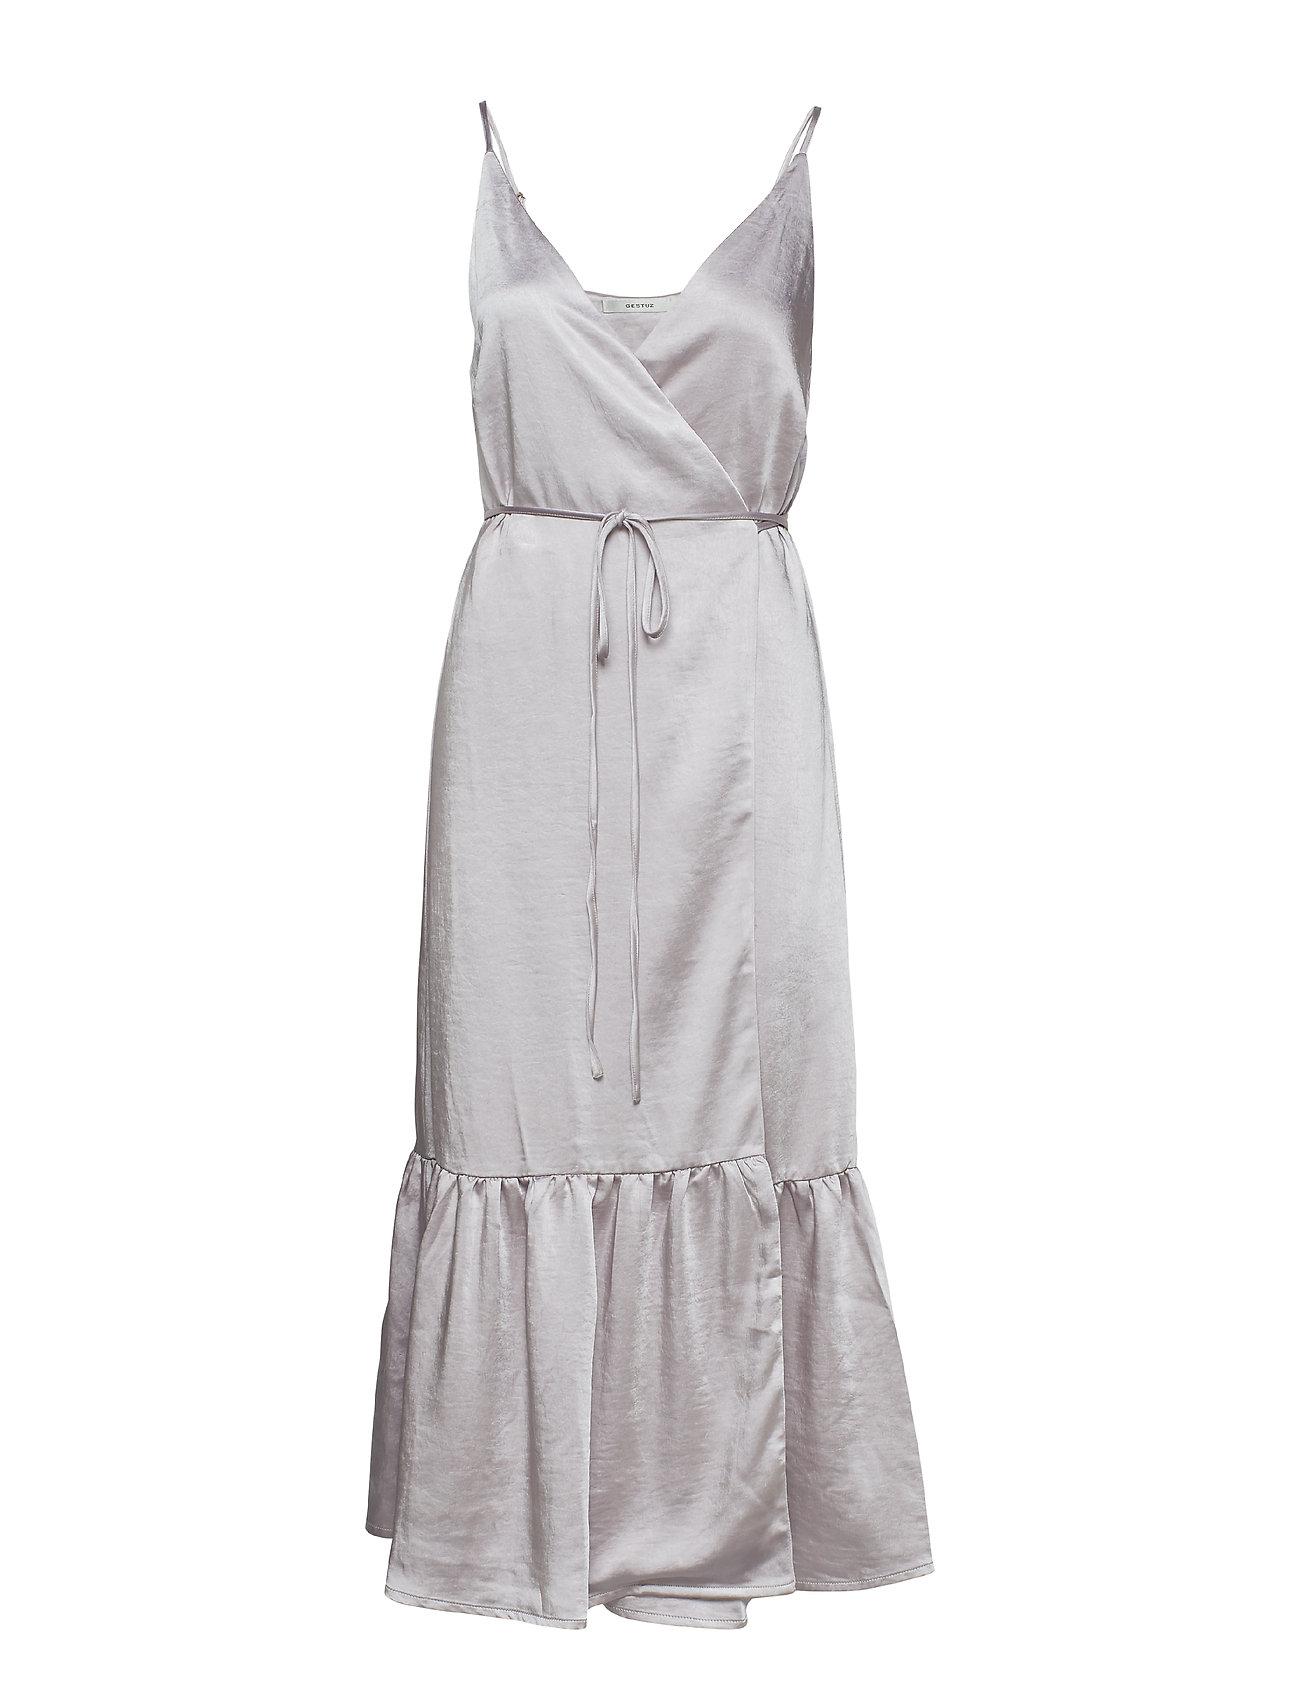 Gestuz Fabi dress MS19 - PURPLE